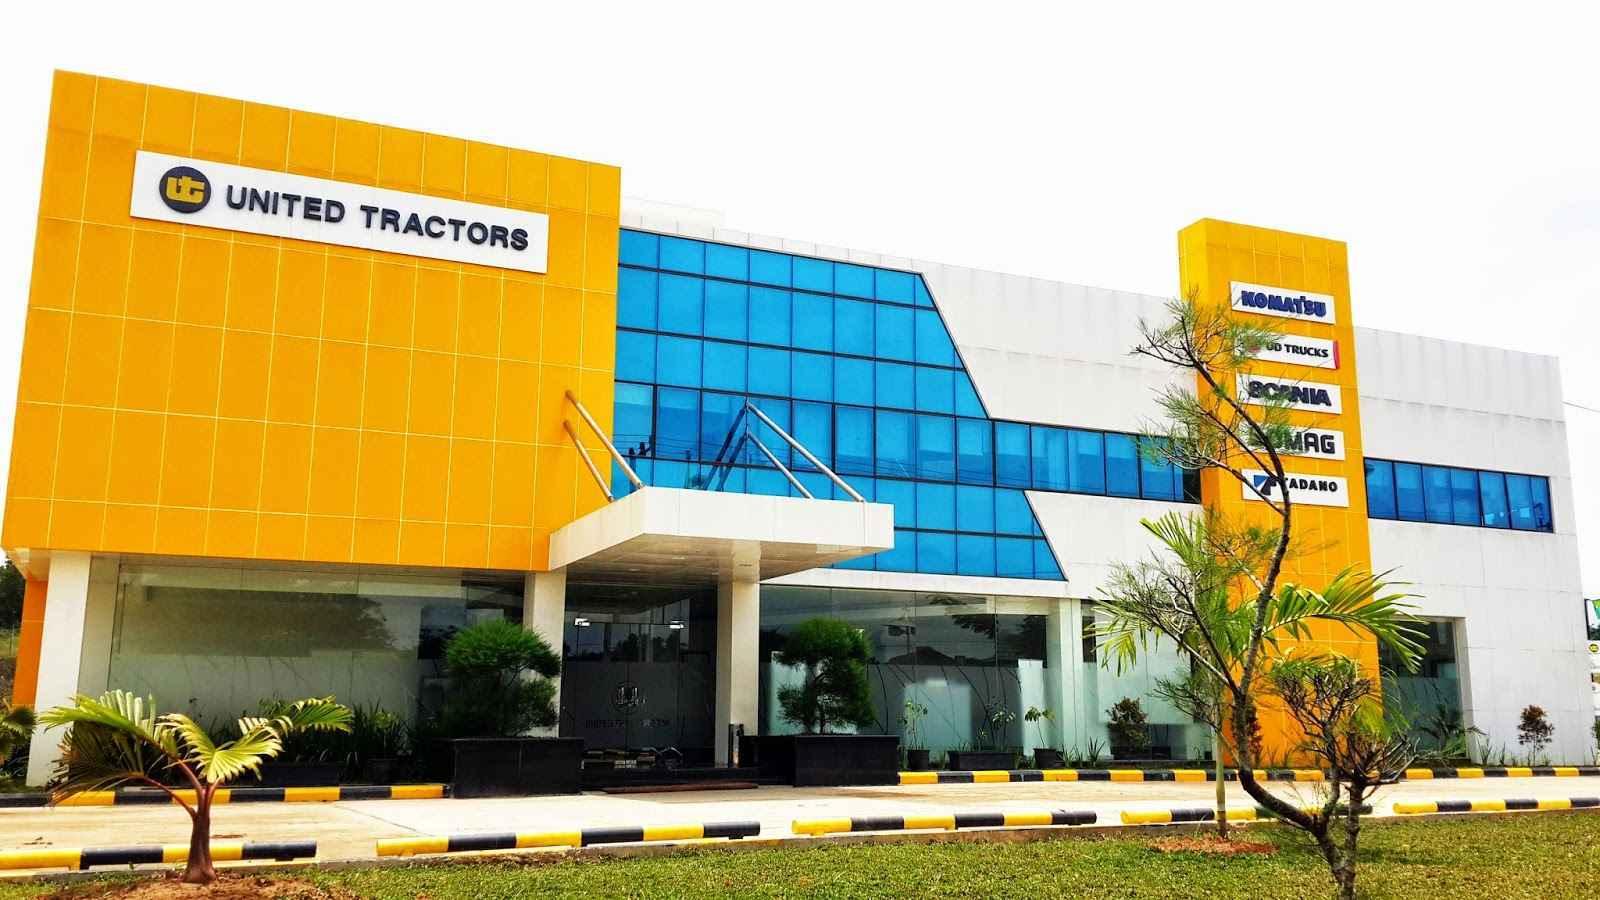 Loker Pabrik Terbaru Via Email PT United Tractors Lulusan S1